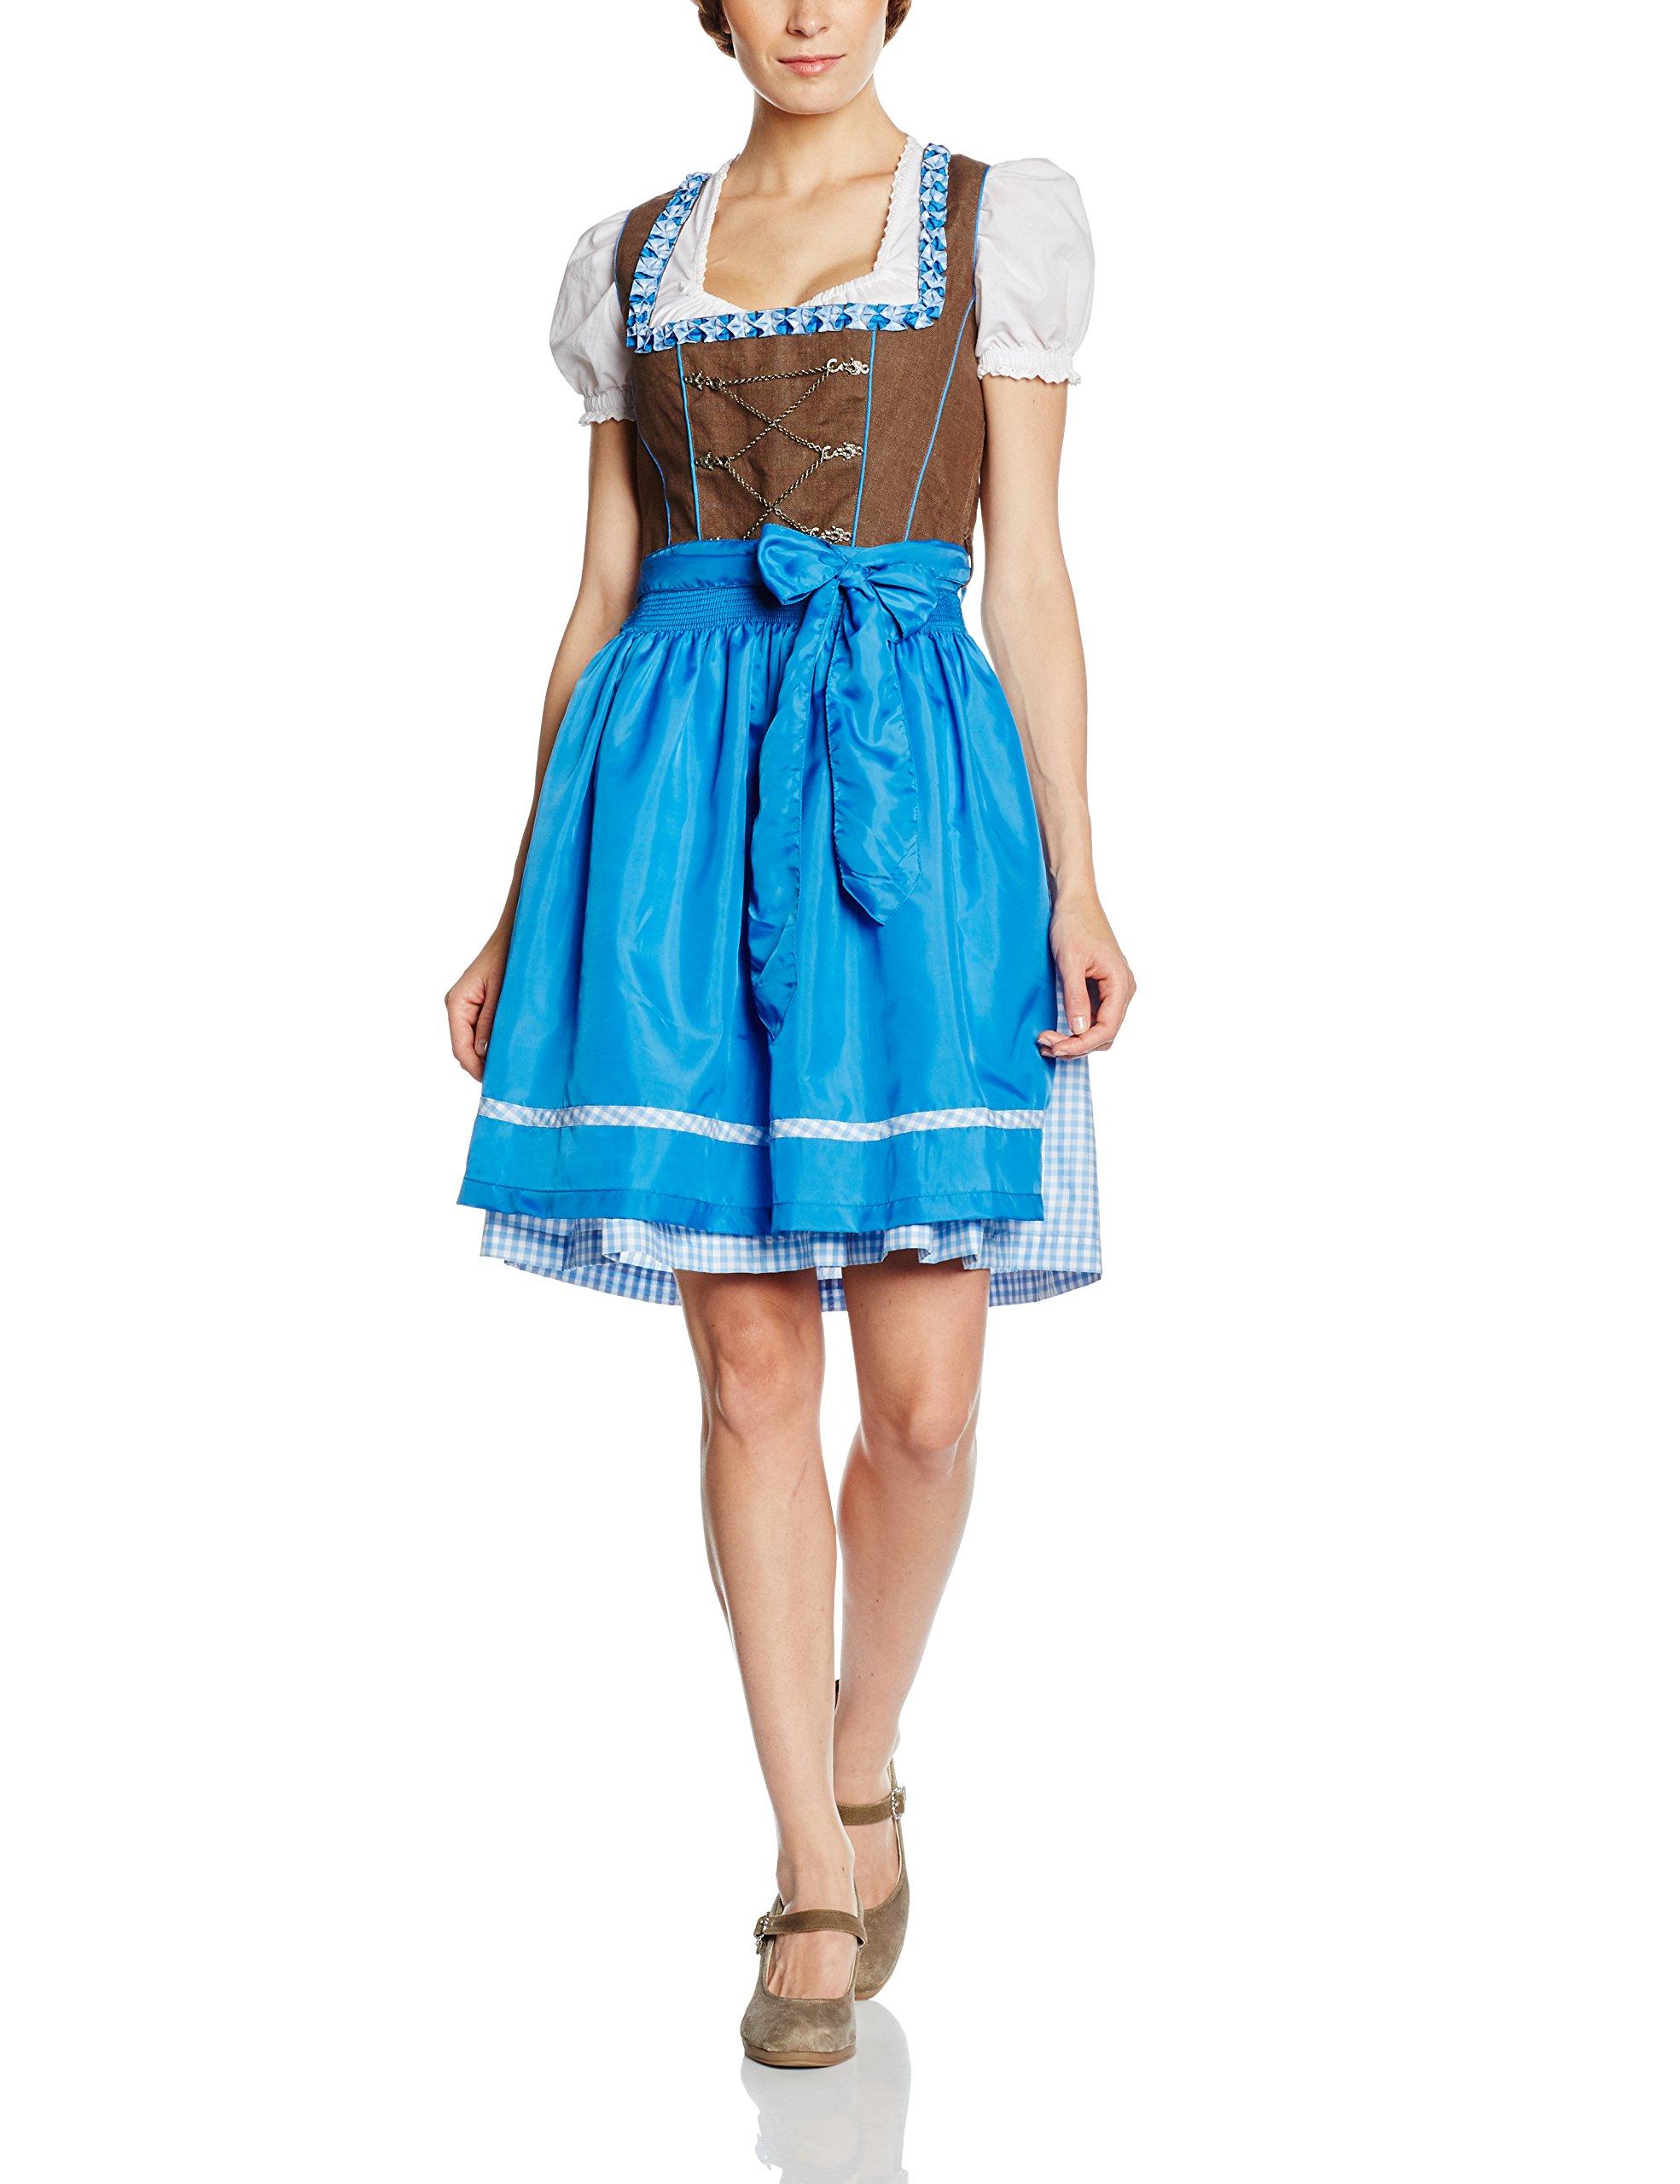 blue42 Rißberg Jcc16006amz Von Femme DirndlMulticoloregrey ID9HYEW2